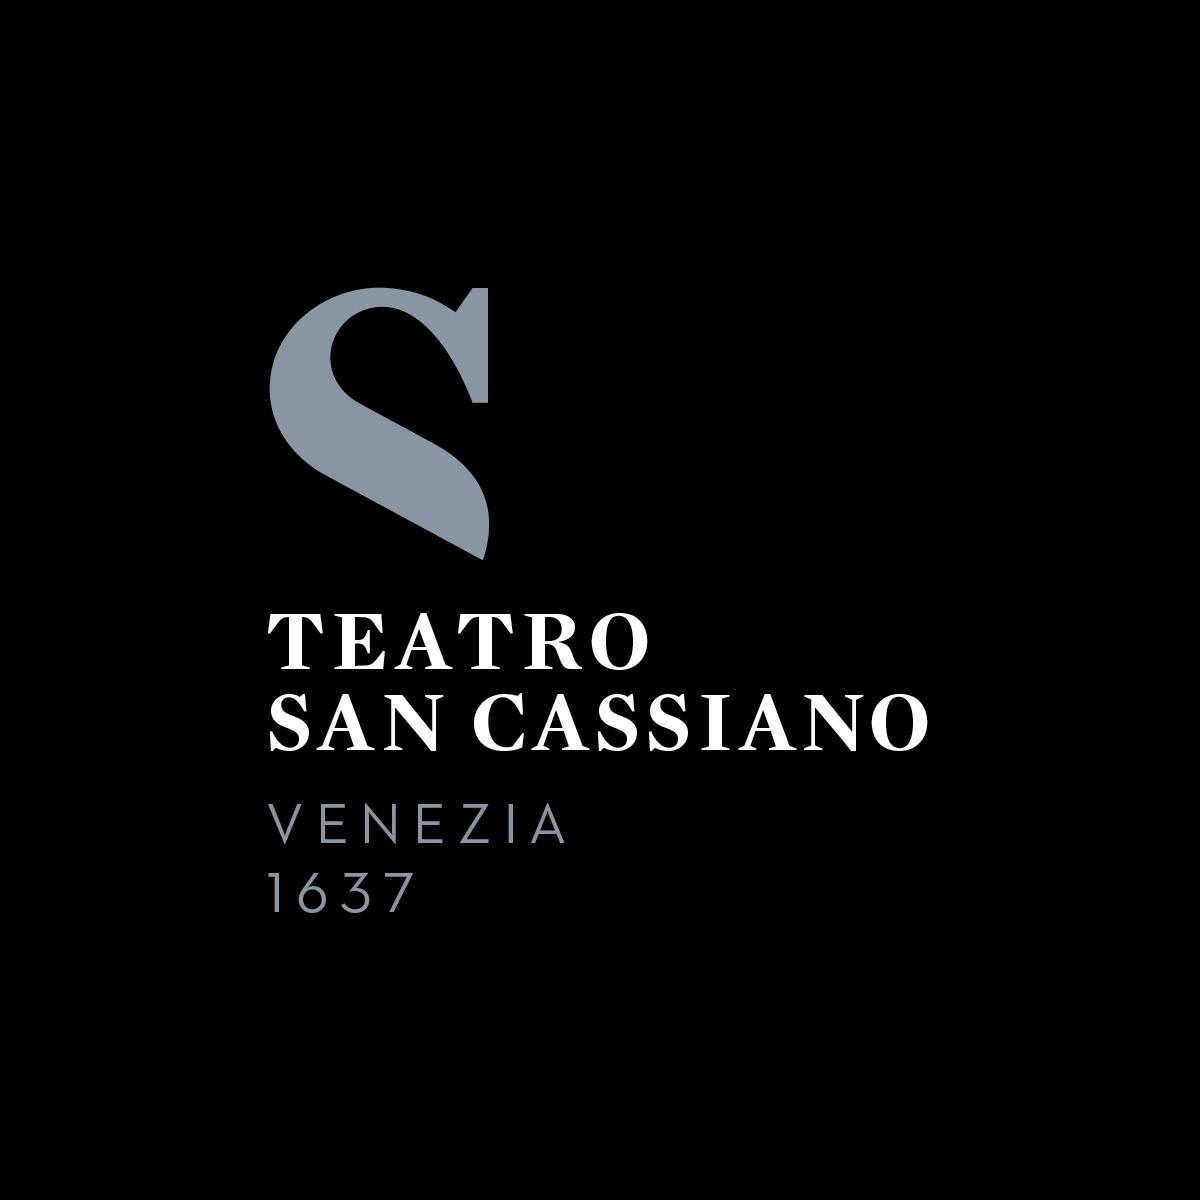 Teatro-San-CassianoIdentity